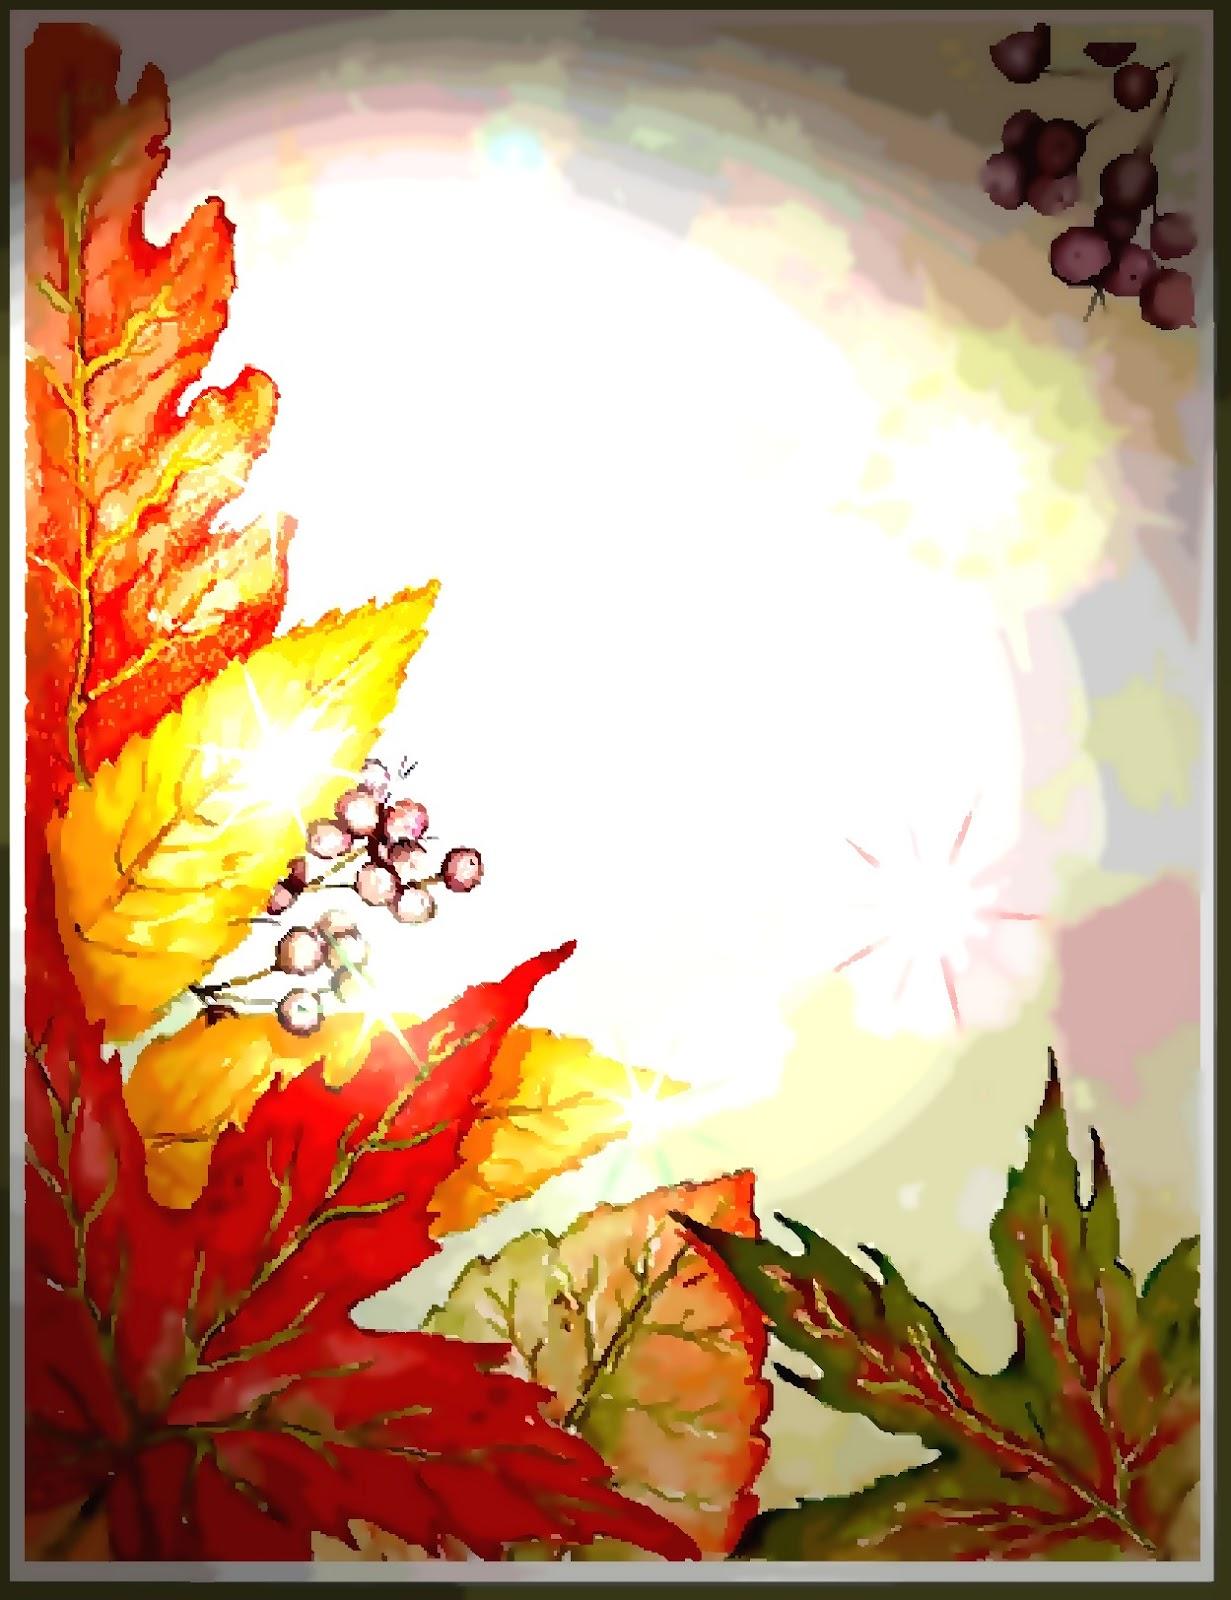 christian fall wallpaper - photo #24